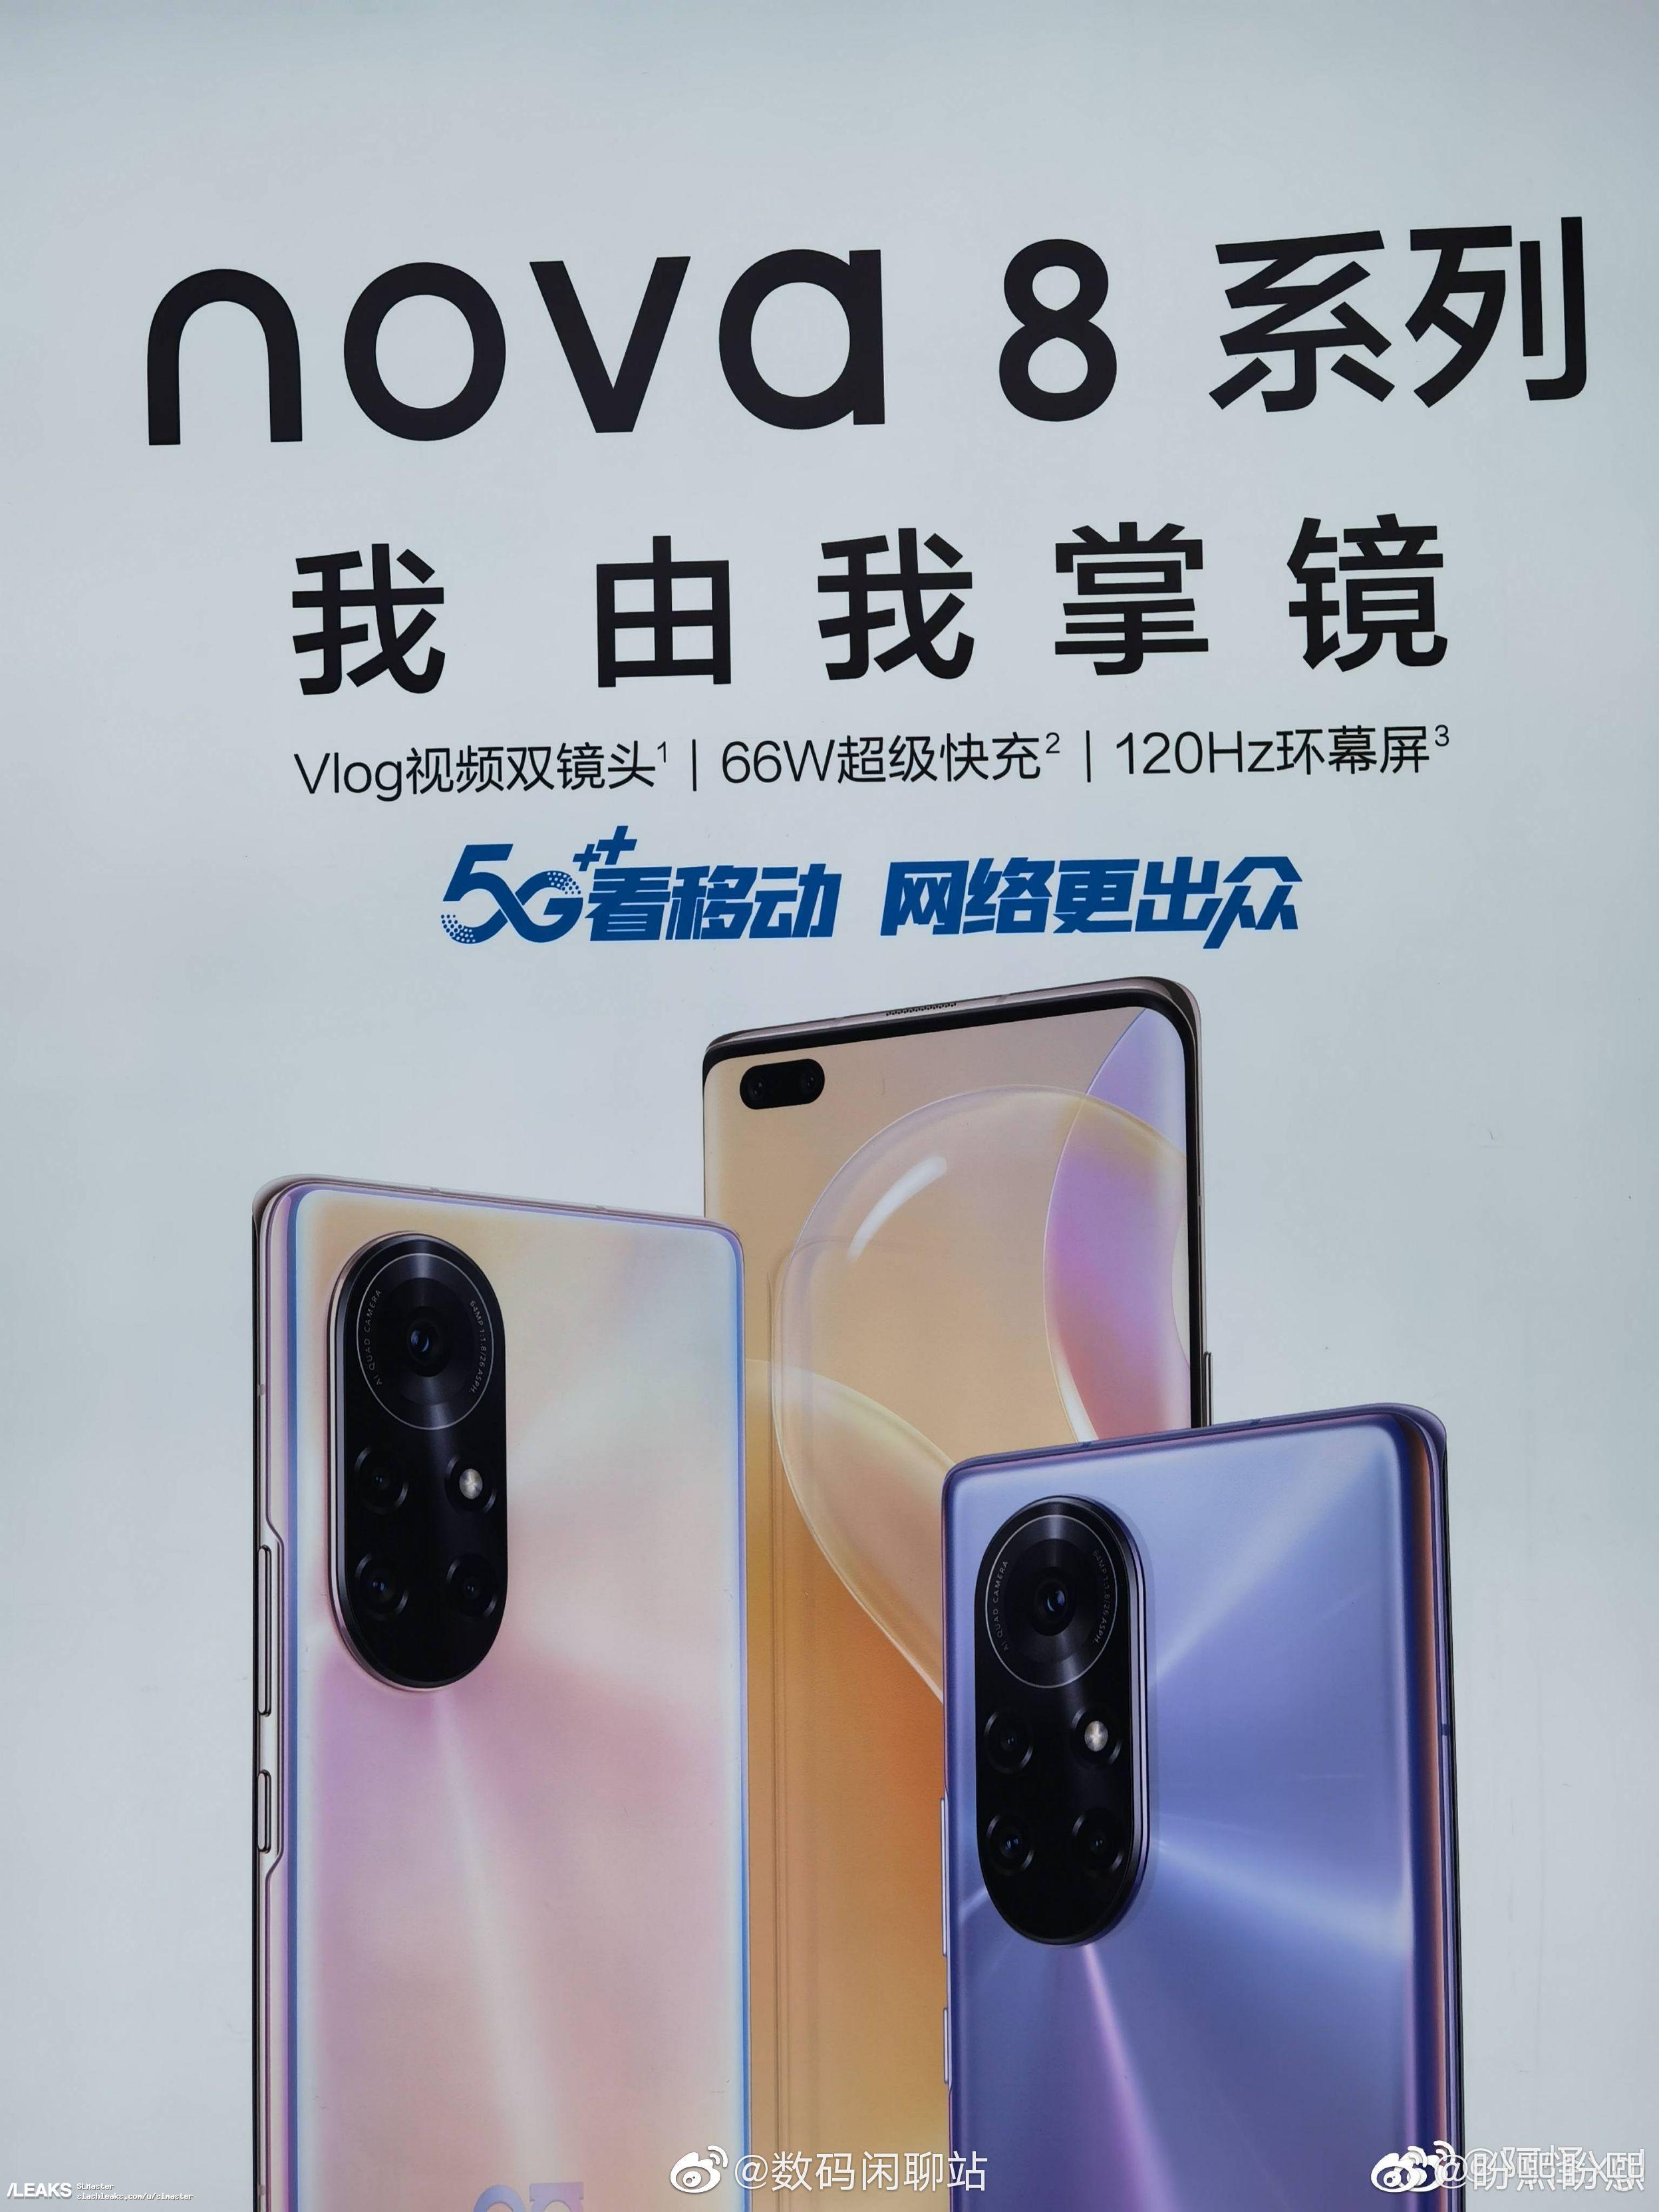 img Huawei Nova 8 Pro 5G Poster Leaks